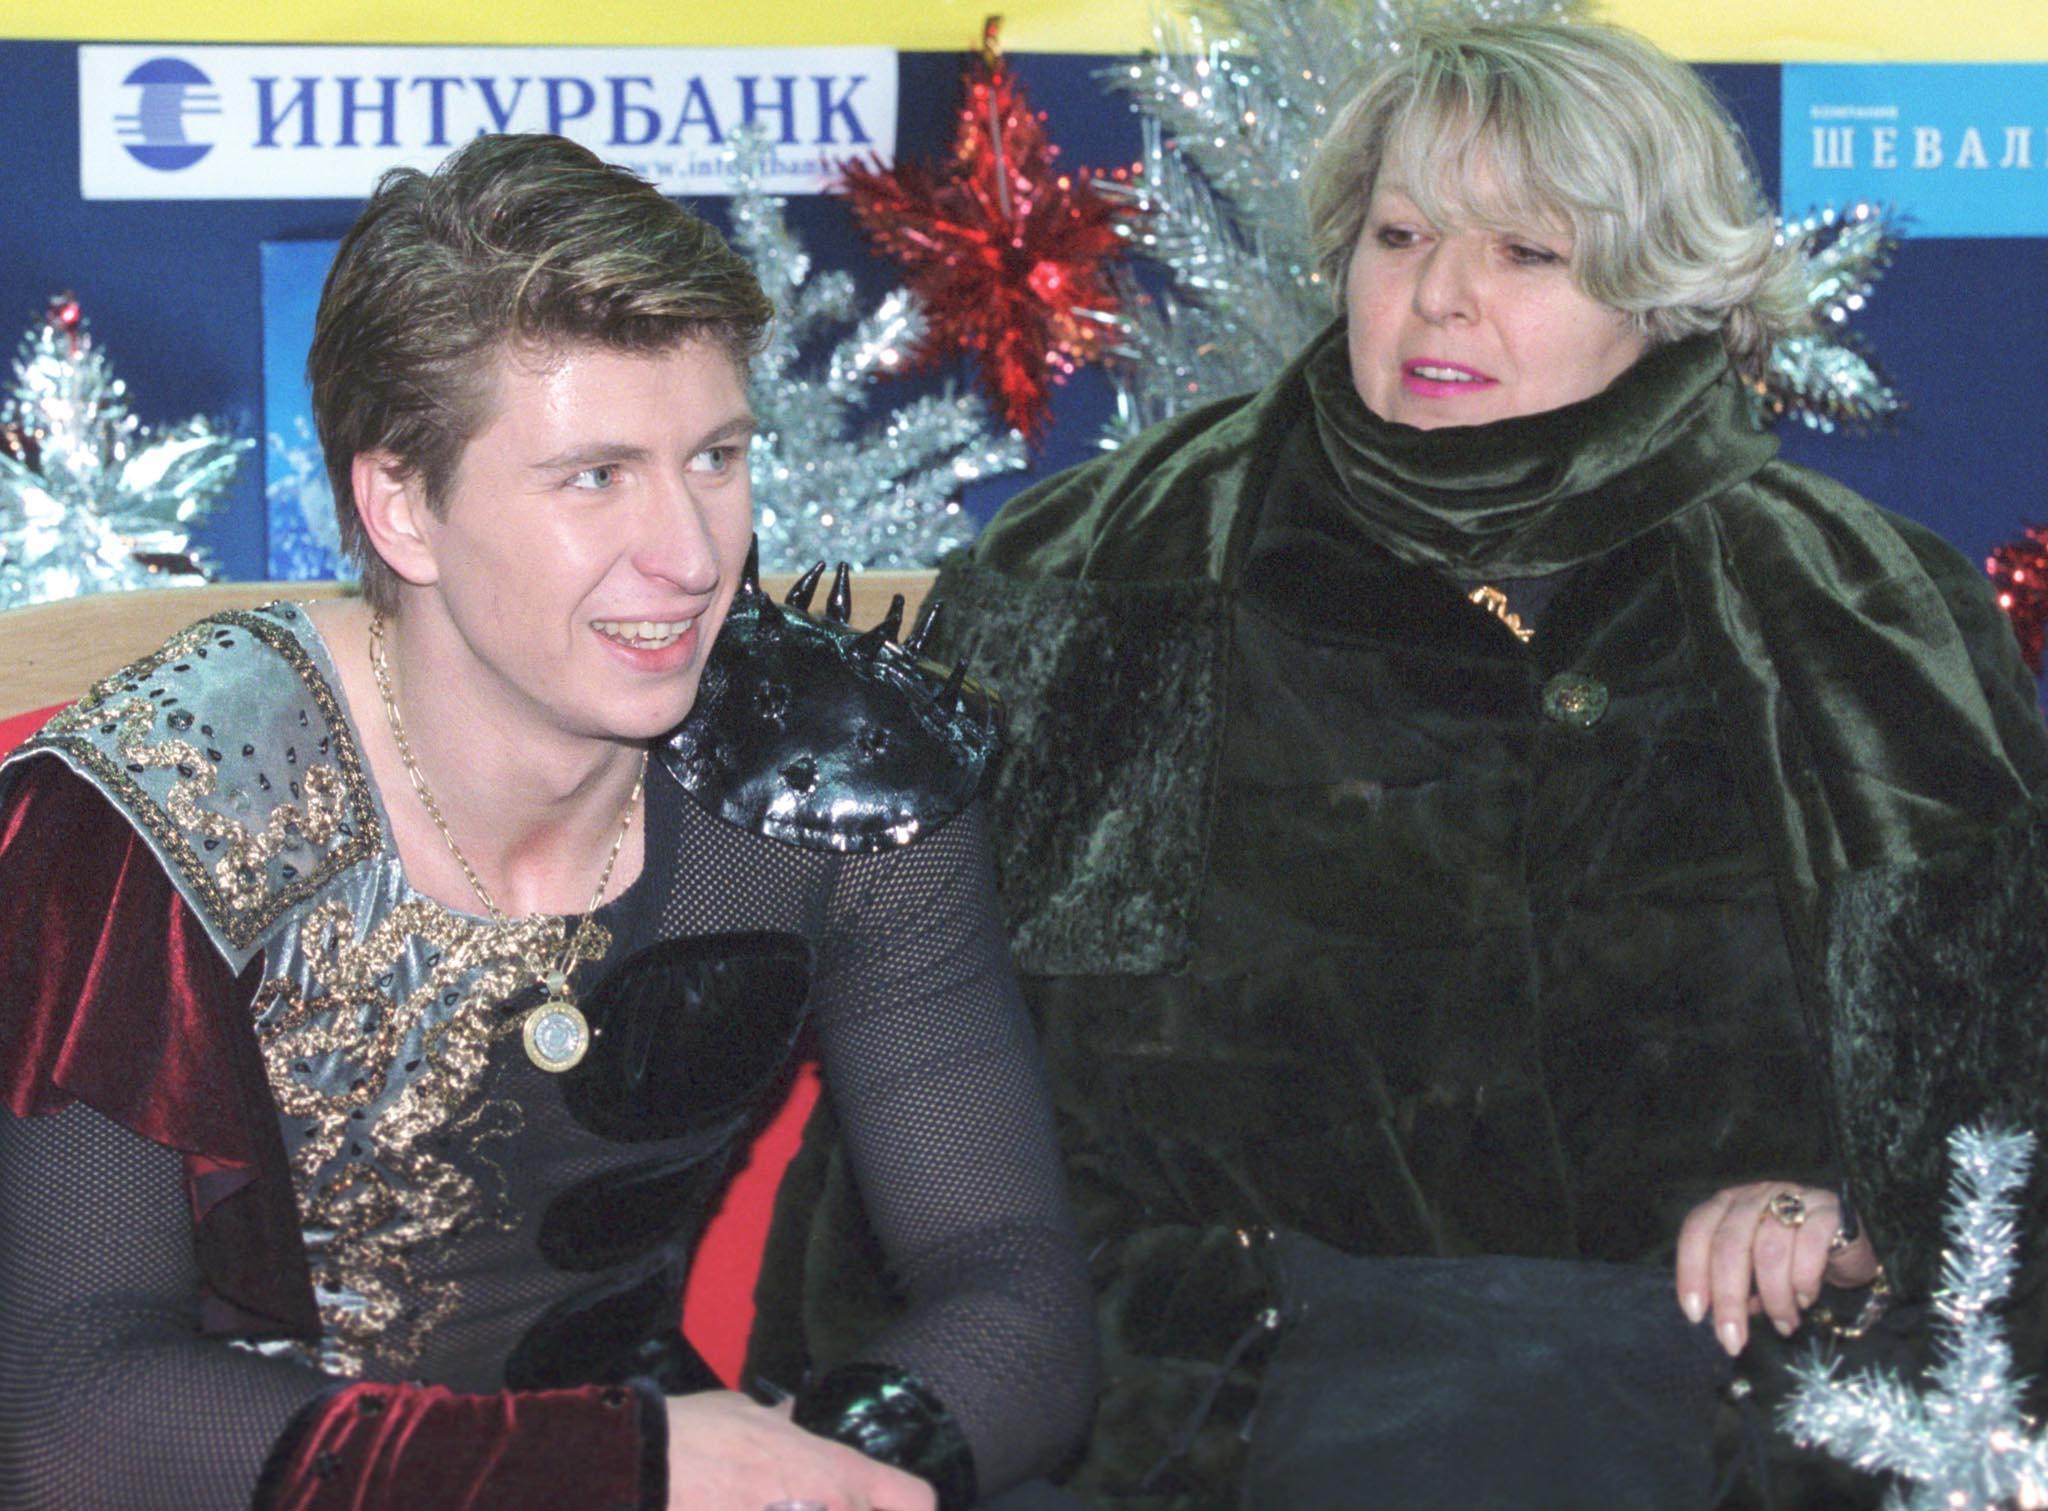 Ягудин и Тарасова в 2000 году. Фото © ИТАР-ТАСС / Олег Булдаков